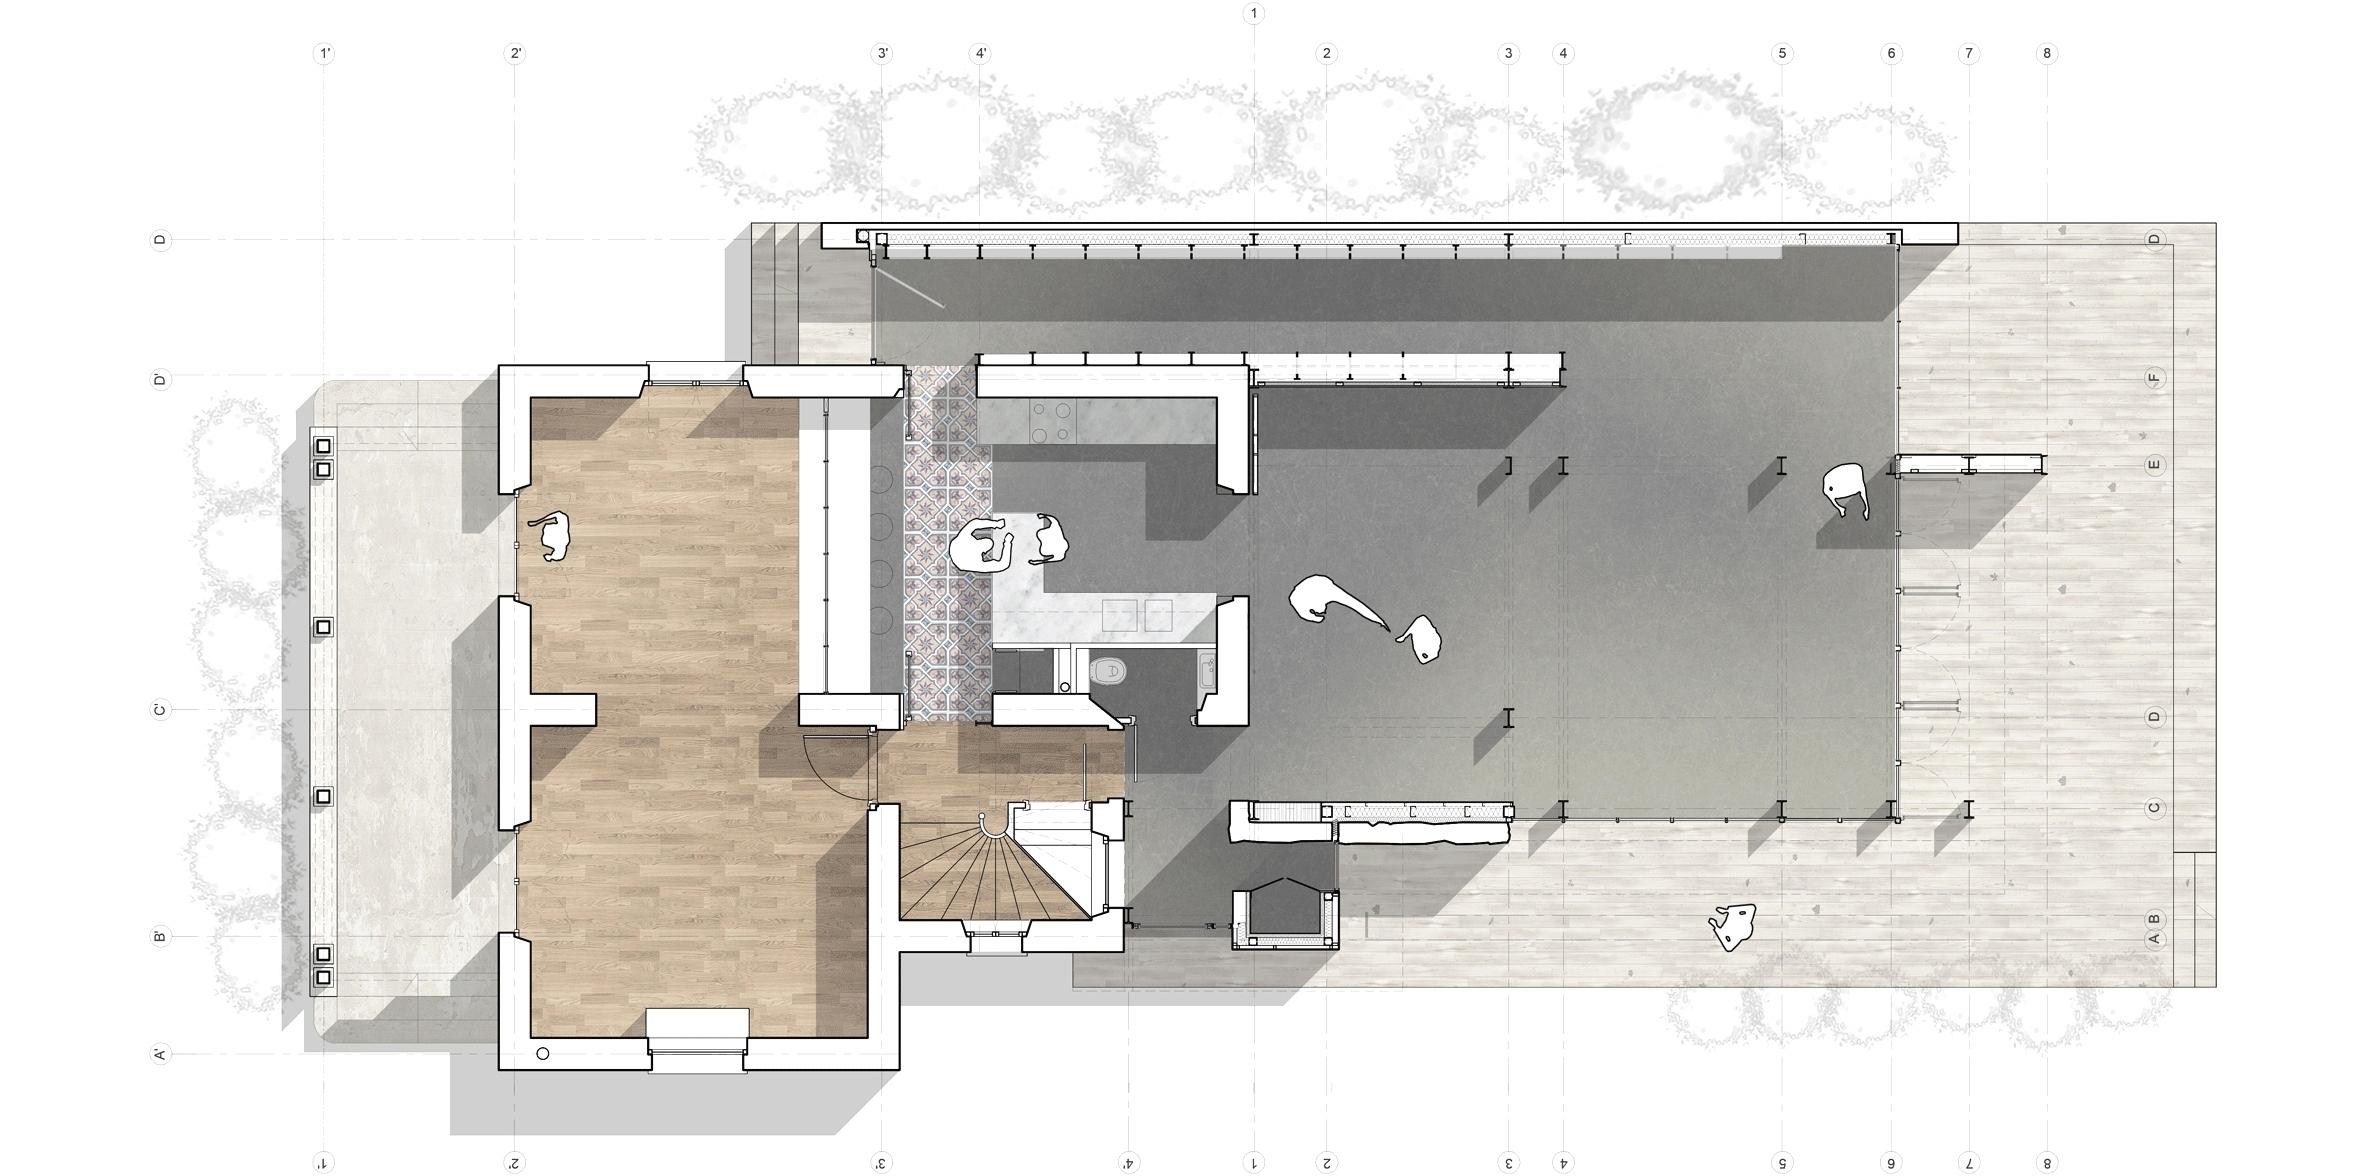 house plans under 200k to build home plans baton rouge bibserver